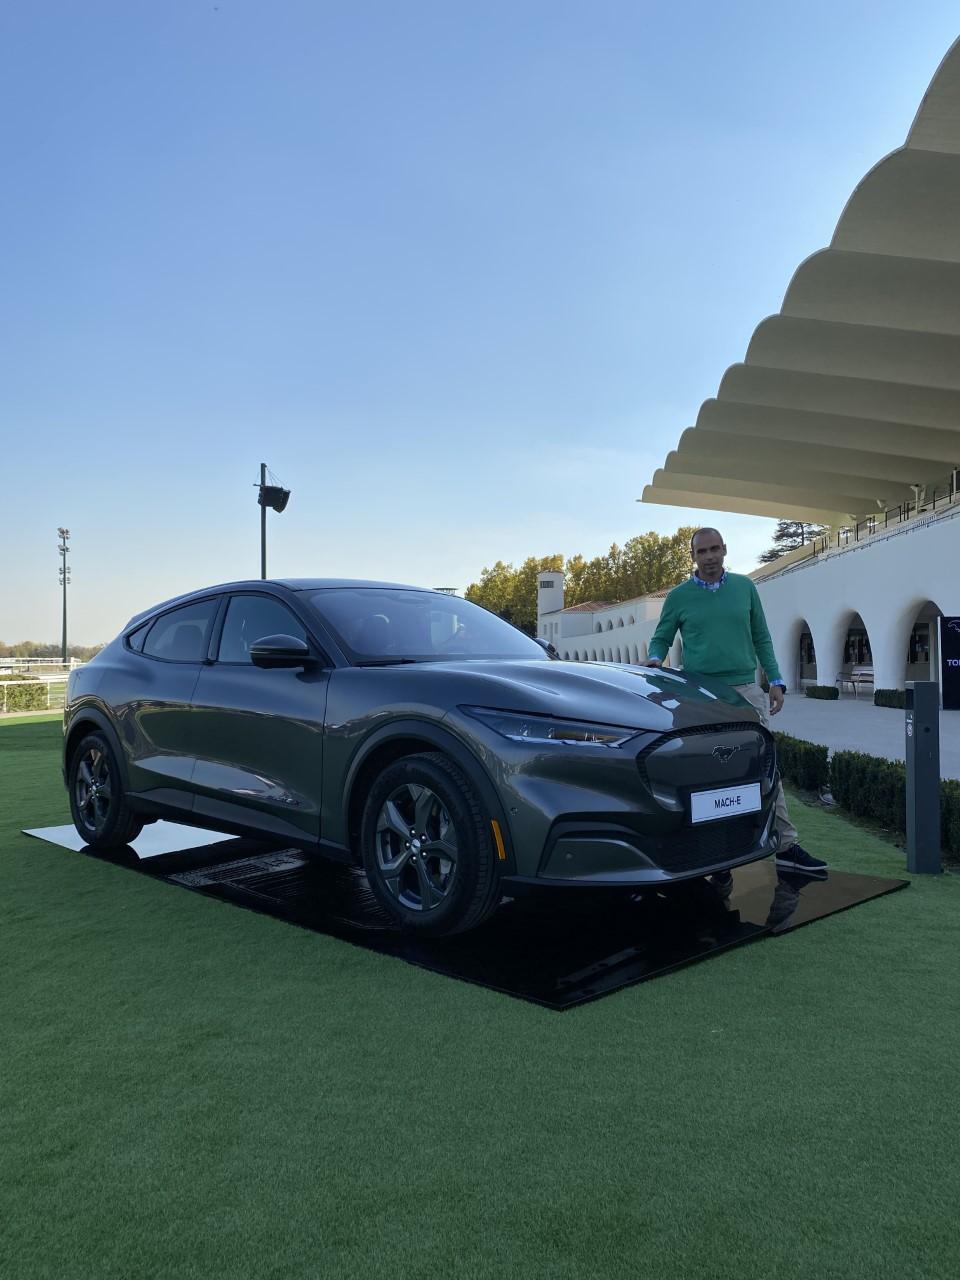 Tertulia AutoFM: Nos subimos al Ford Mustang Mach e